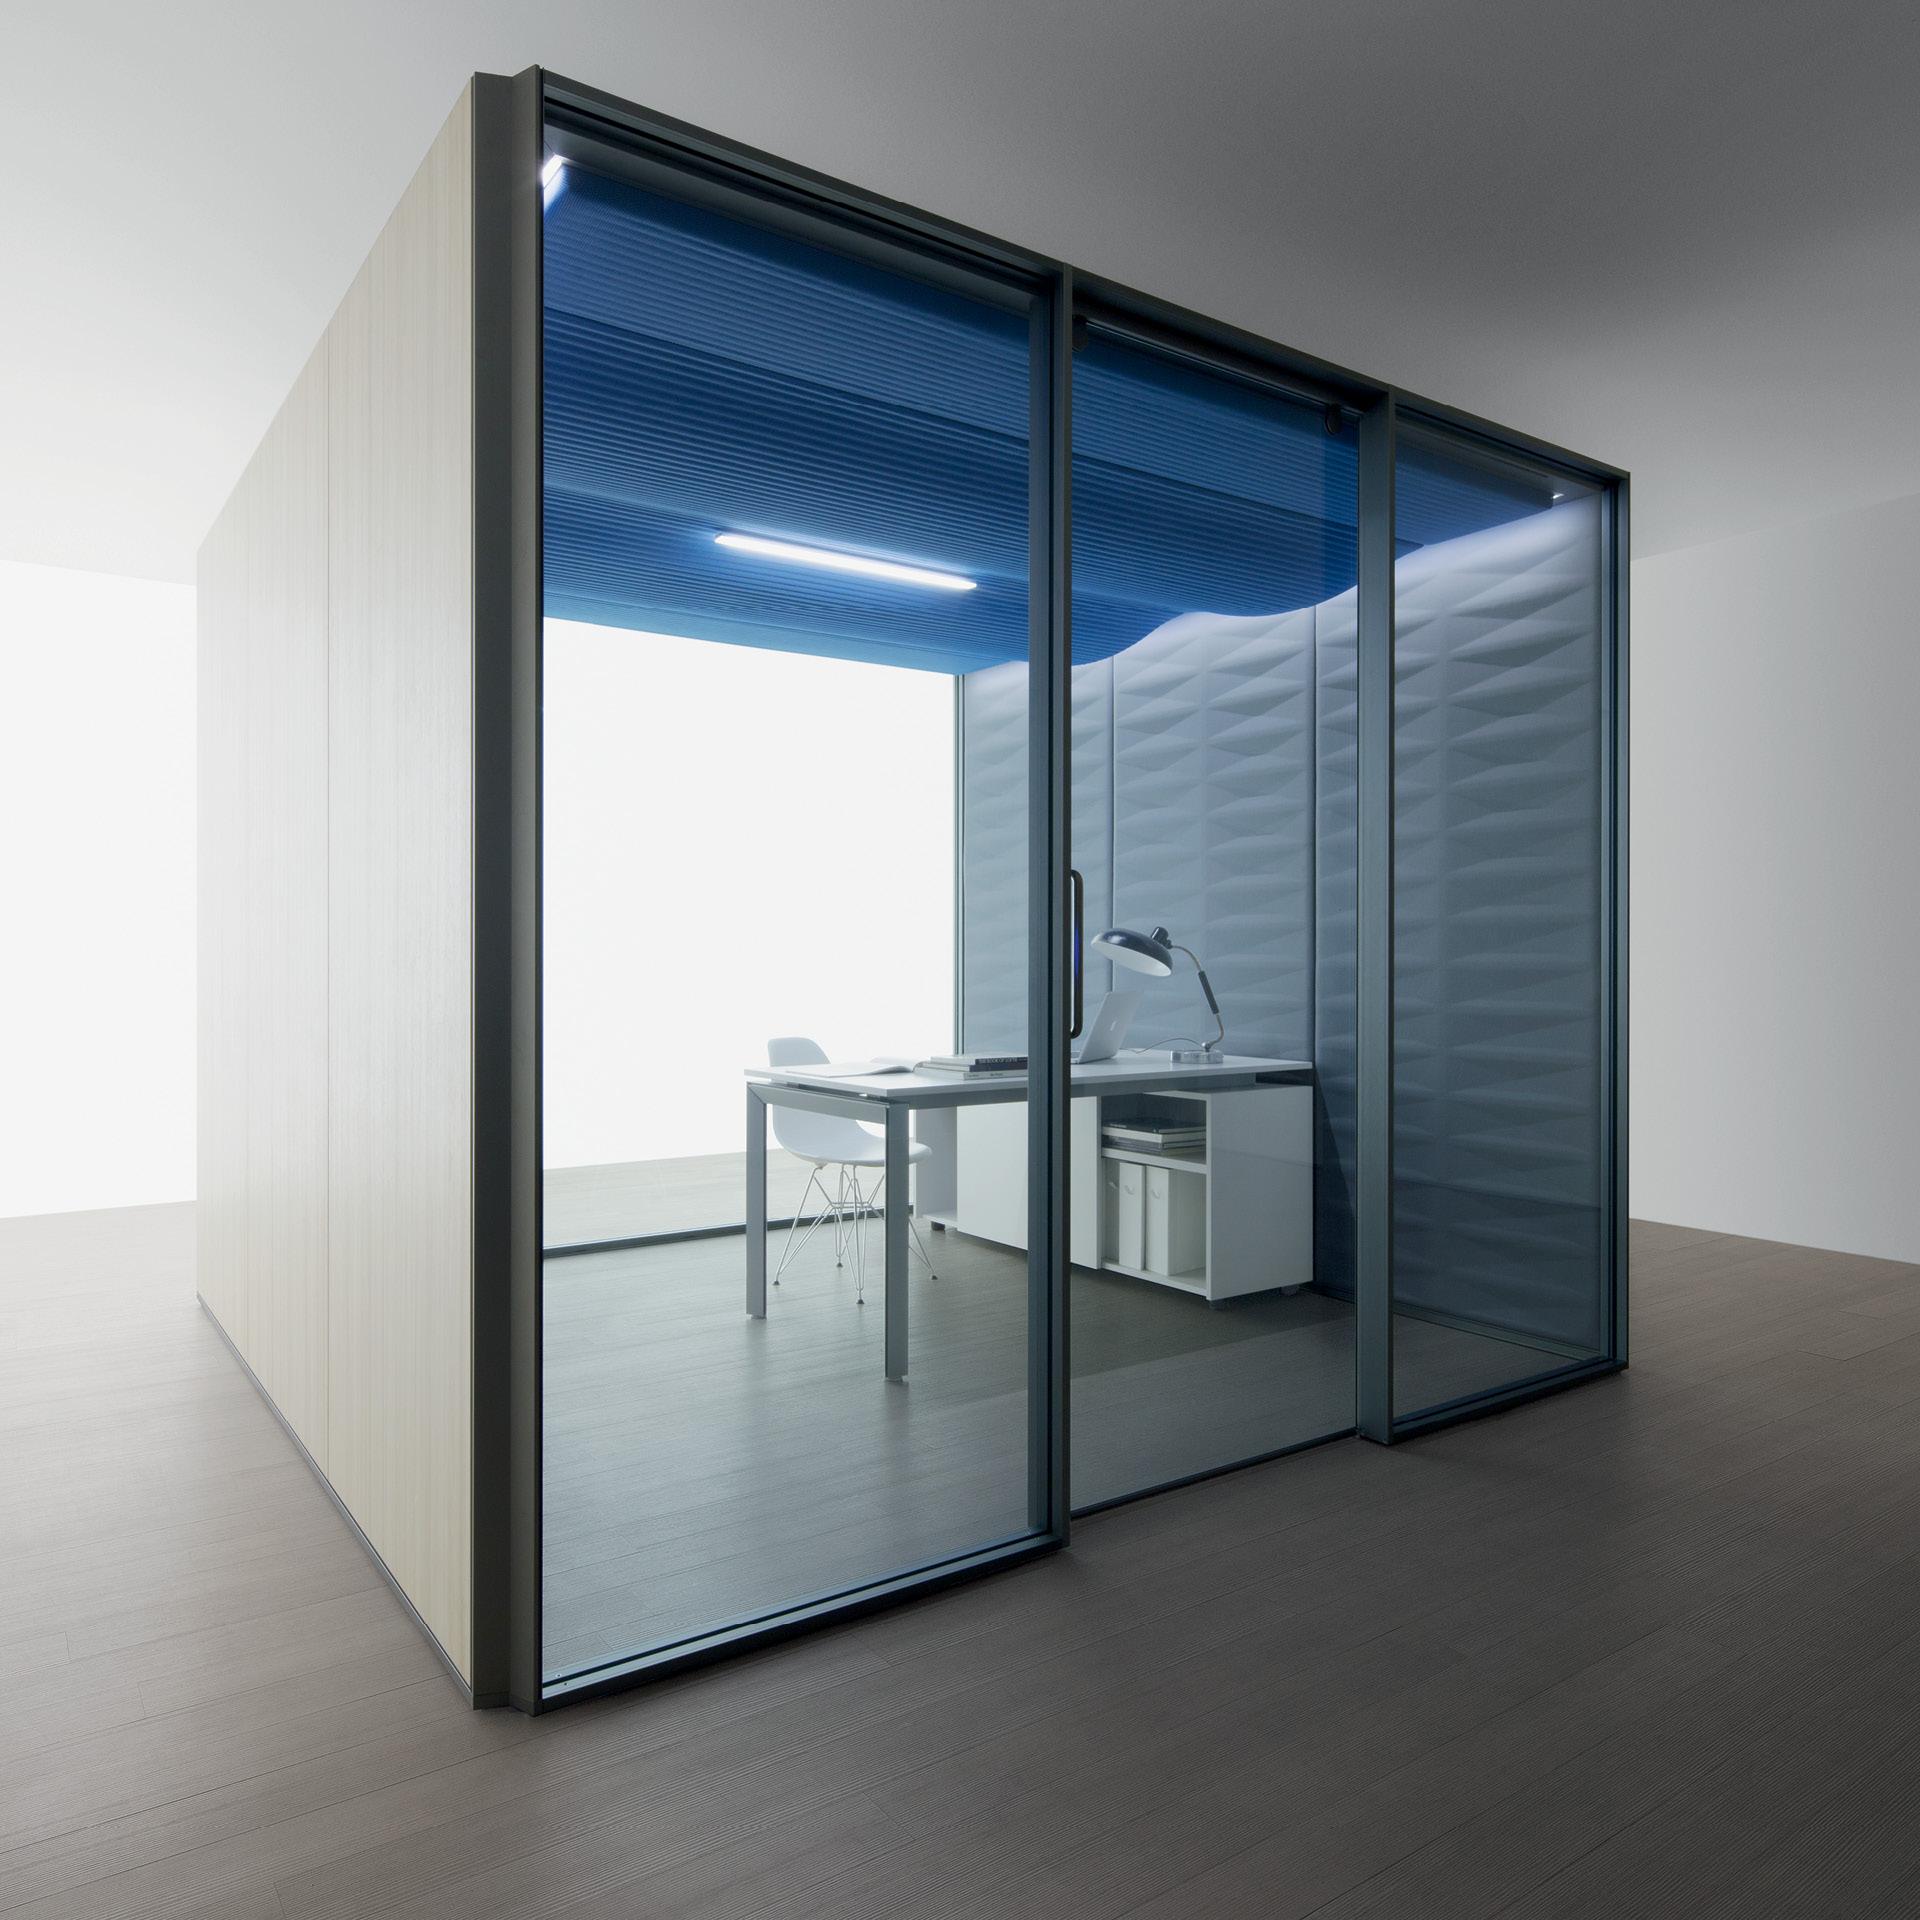 cabines acoustique fermee porte en verre